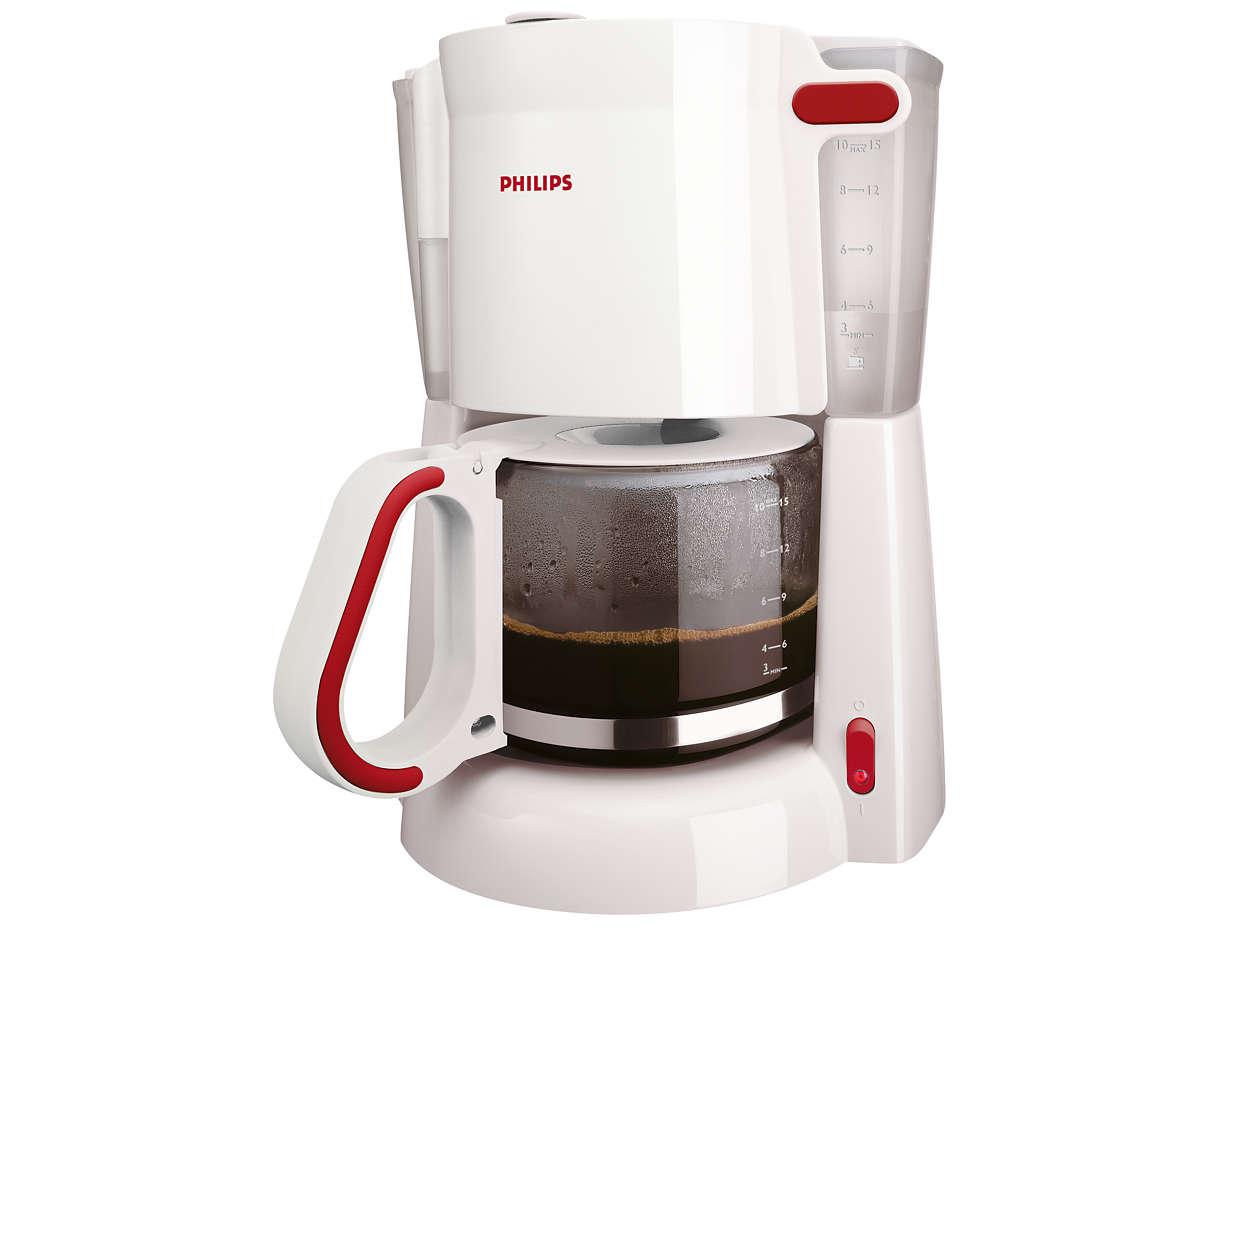 Good coffee easily